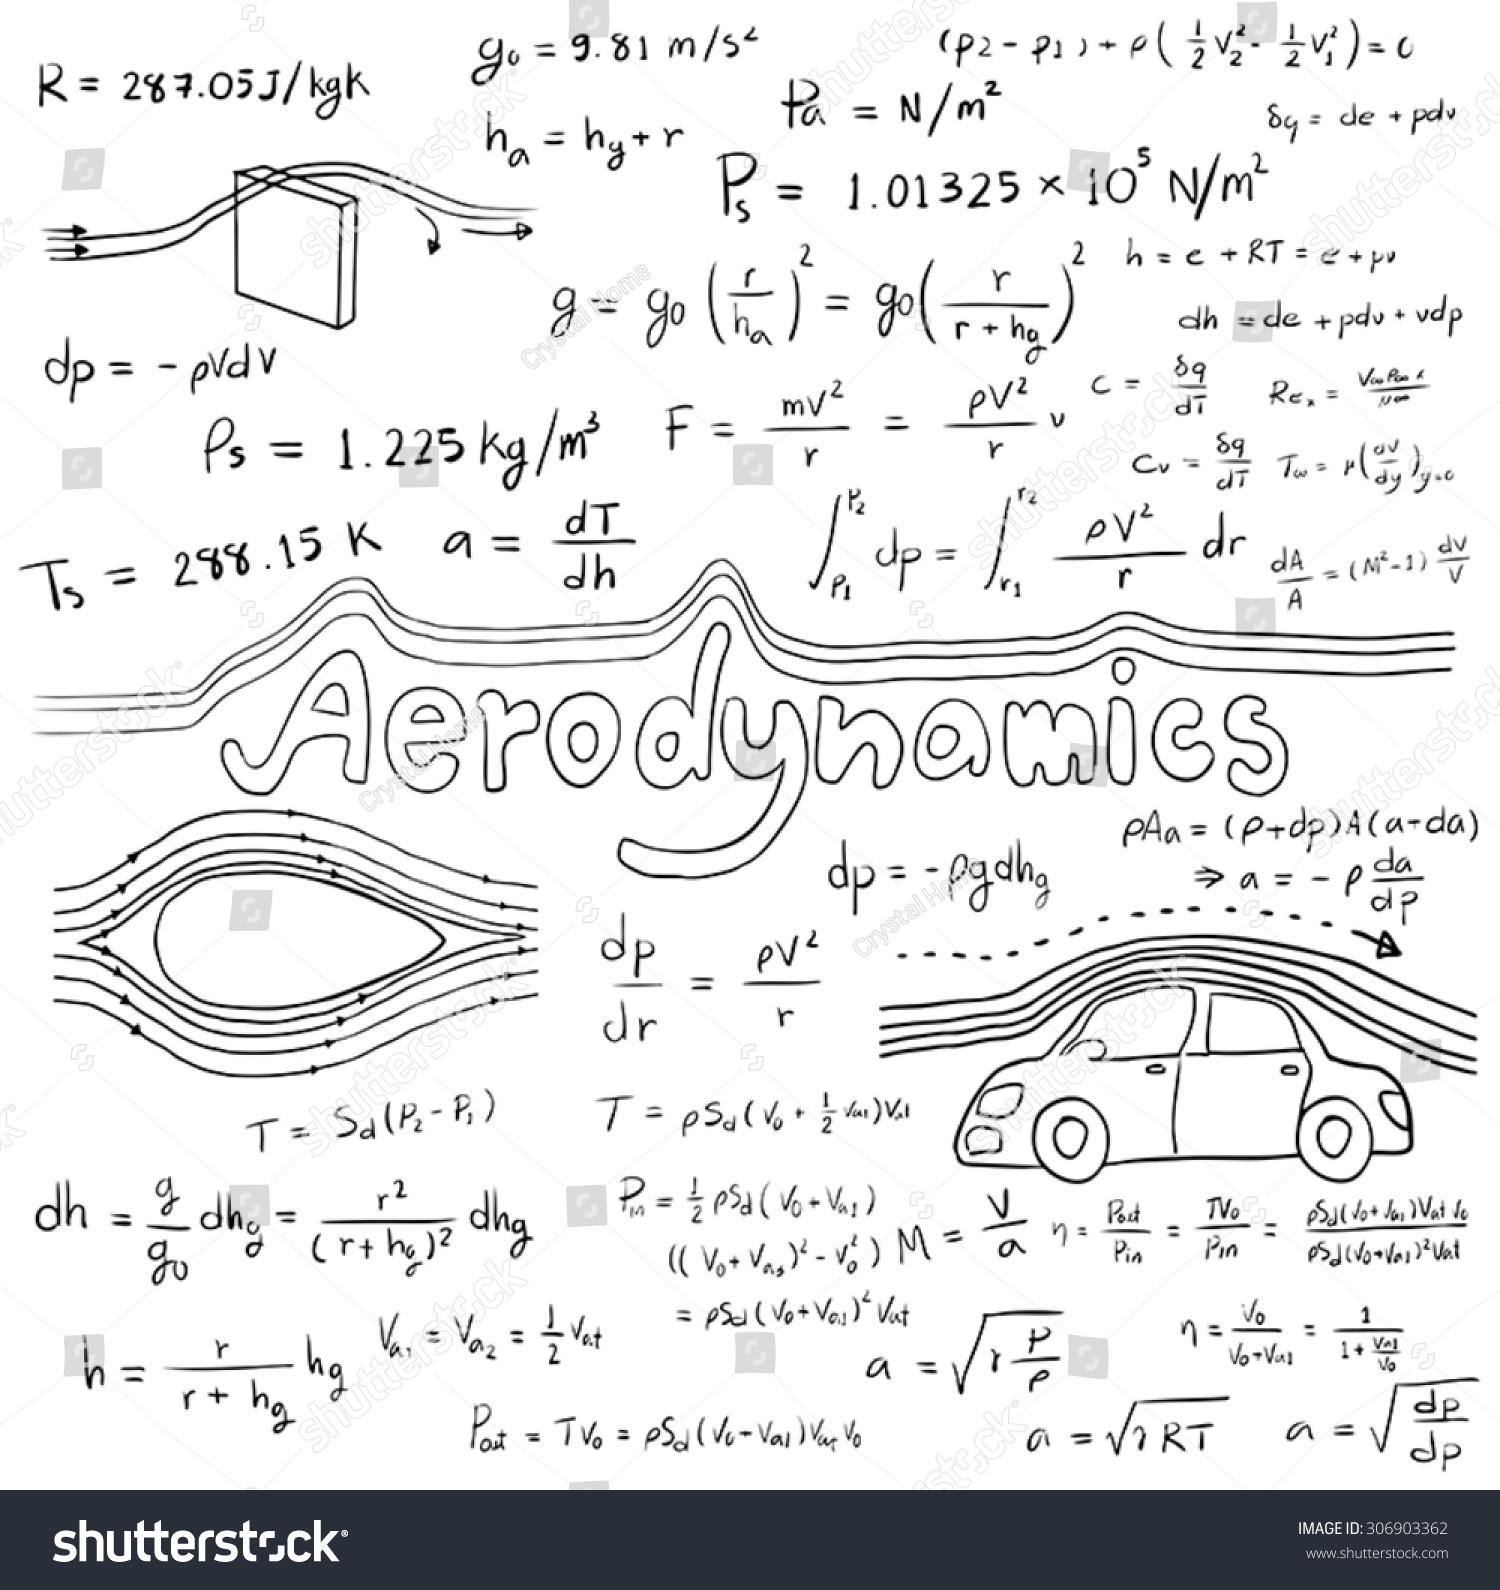 Aerodynamics Law Theory Physics Mathematical Formula Stock Vector